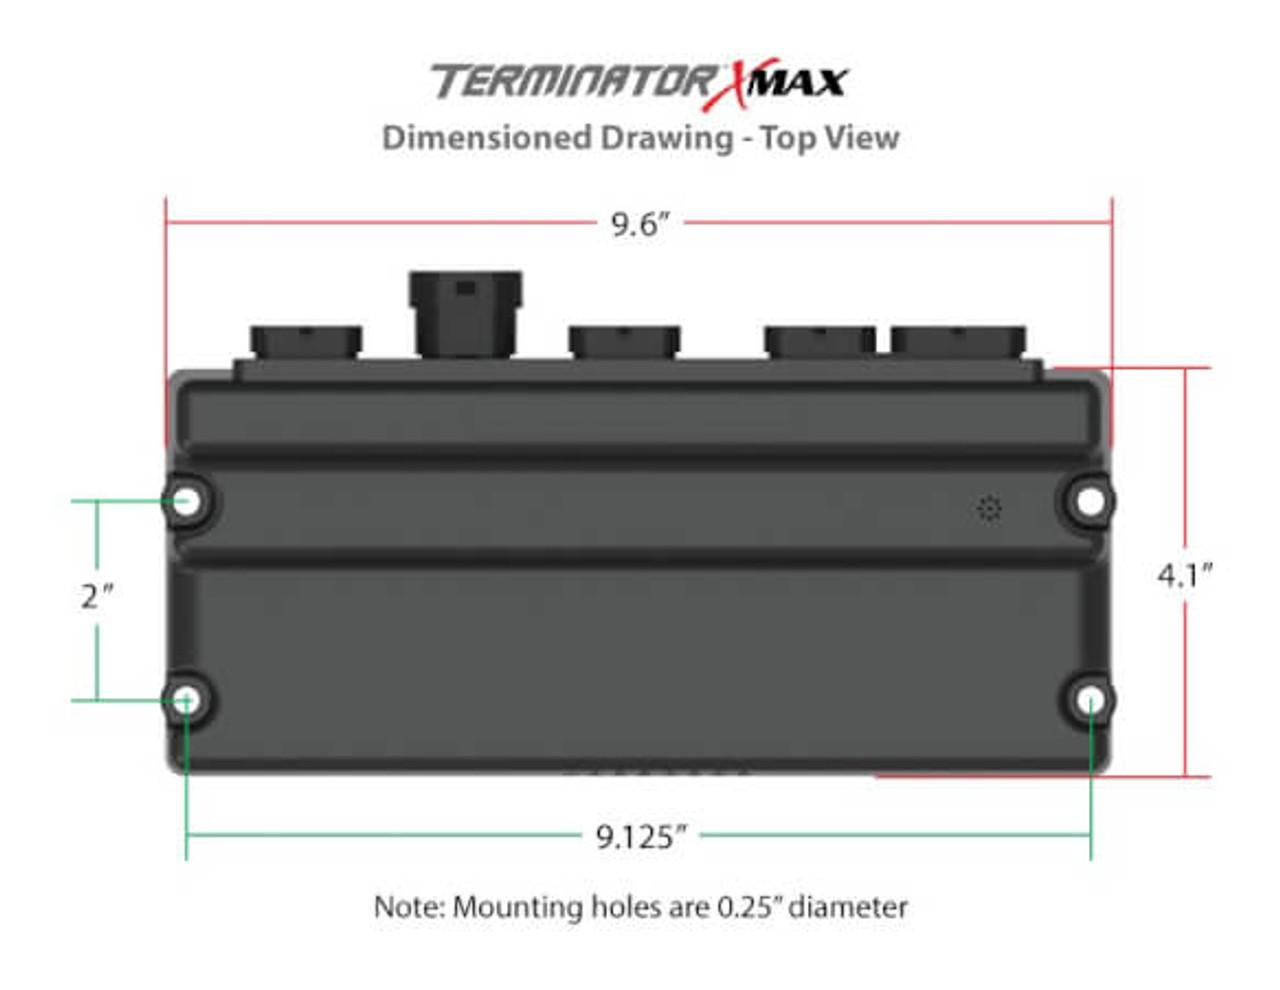 holley terminator x max gm ls standalone ecu wire harness 550 916 24x  [ 1280 x 990 Pixel ]